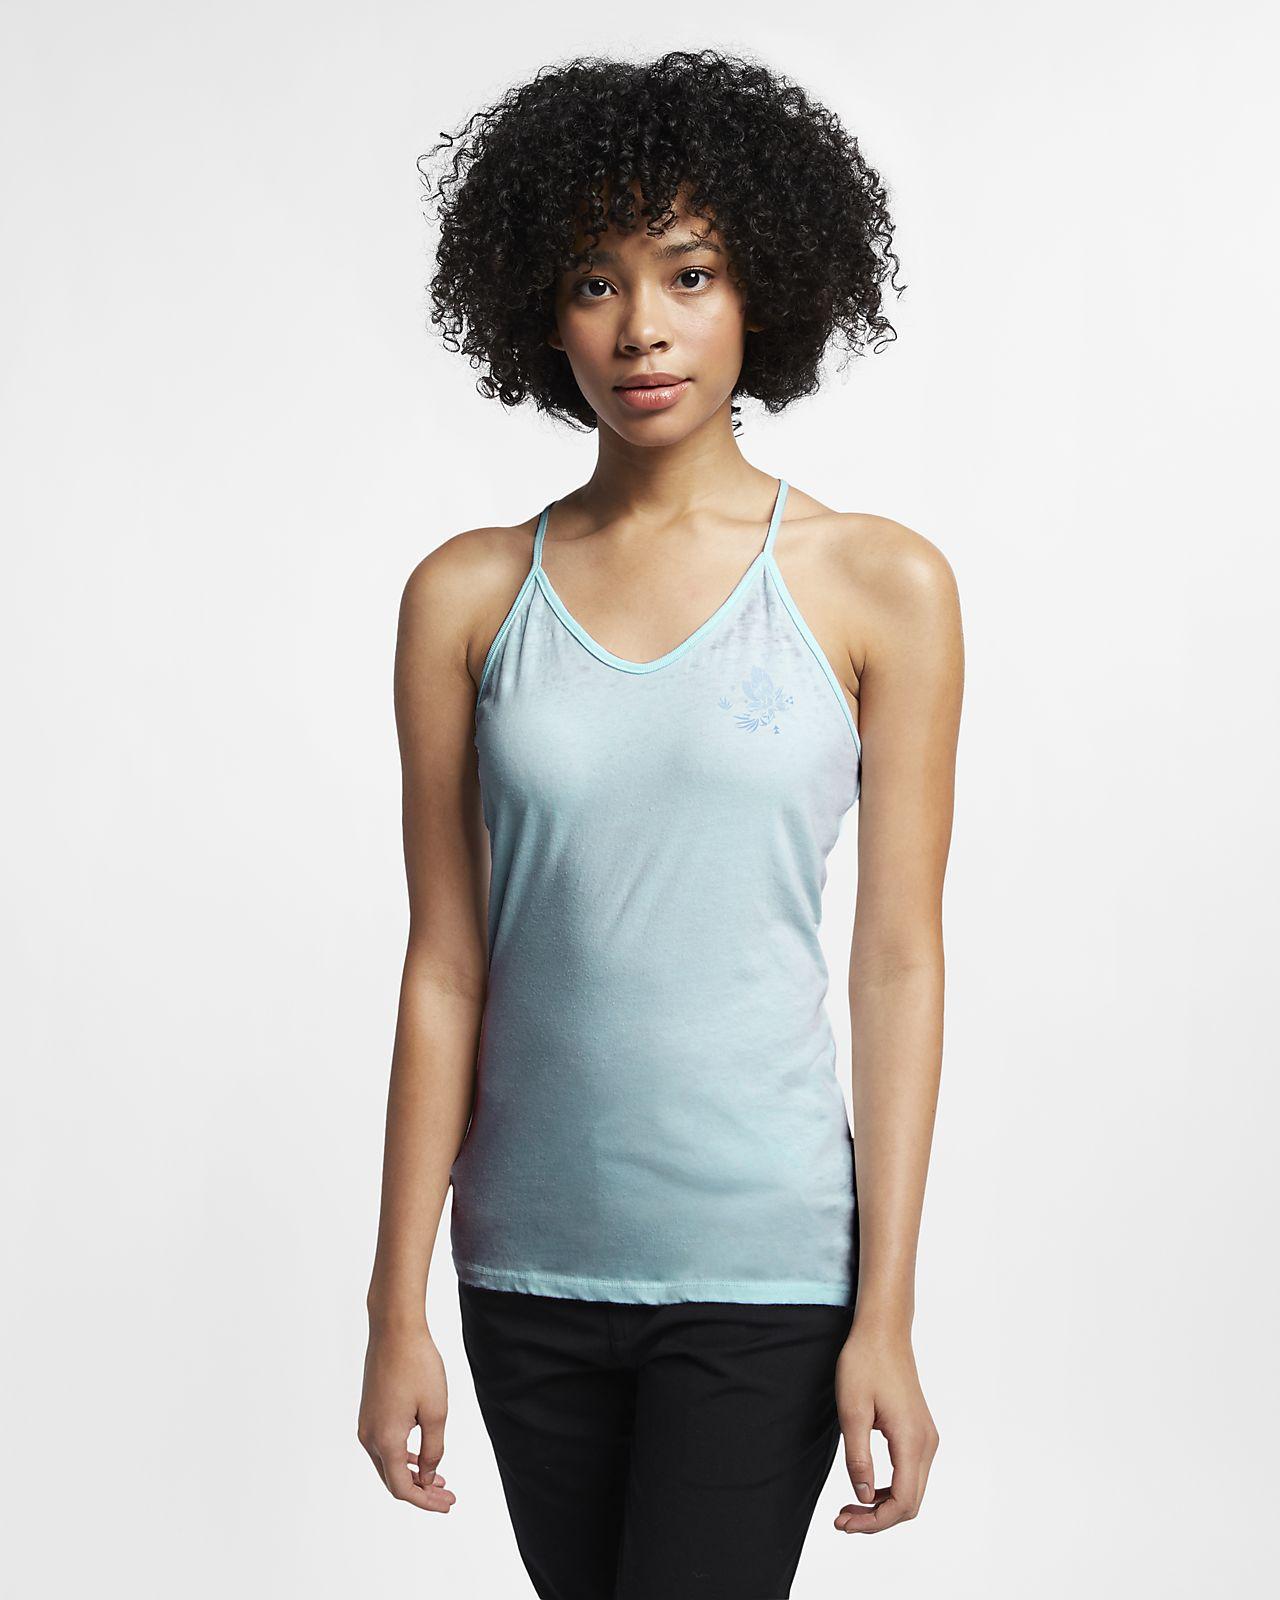 Camisola sem mangas Hurley Sets Burnout para mulher